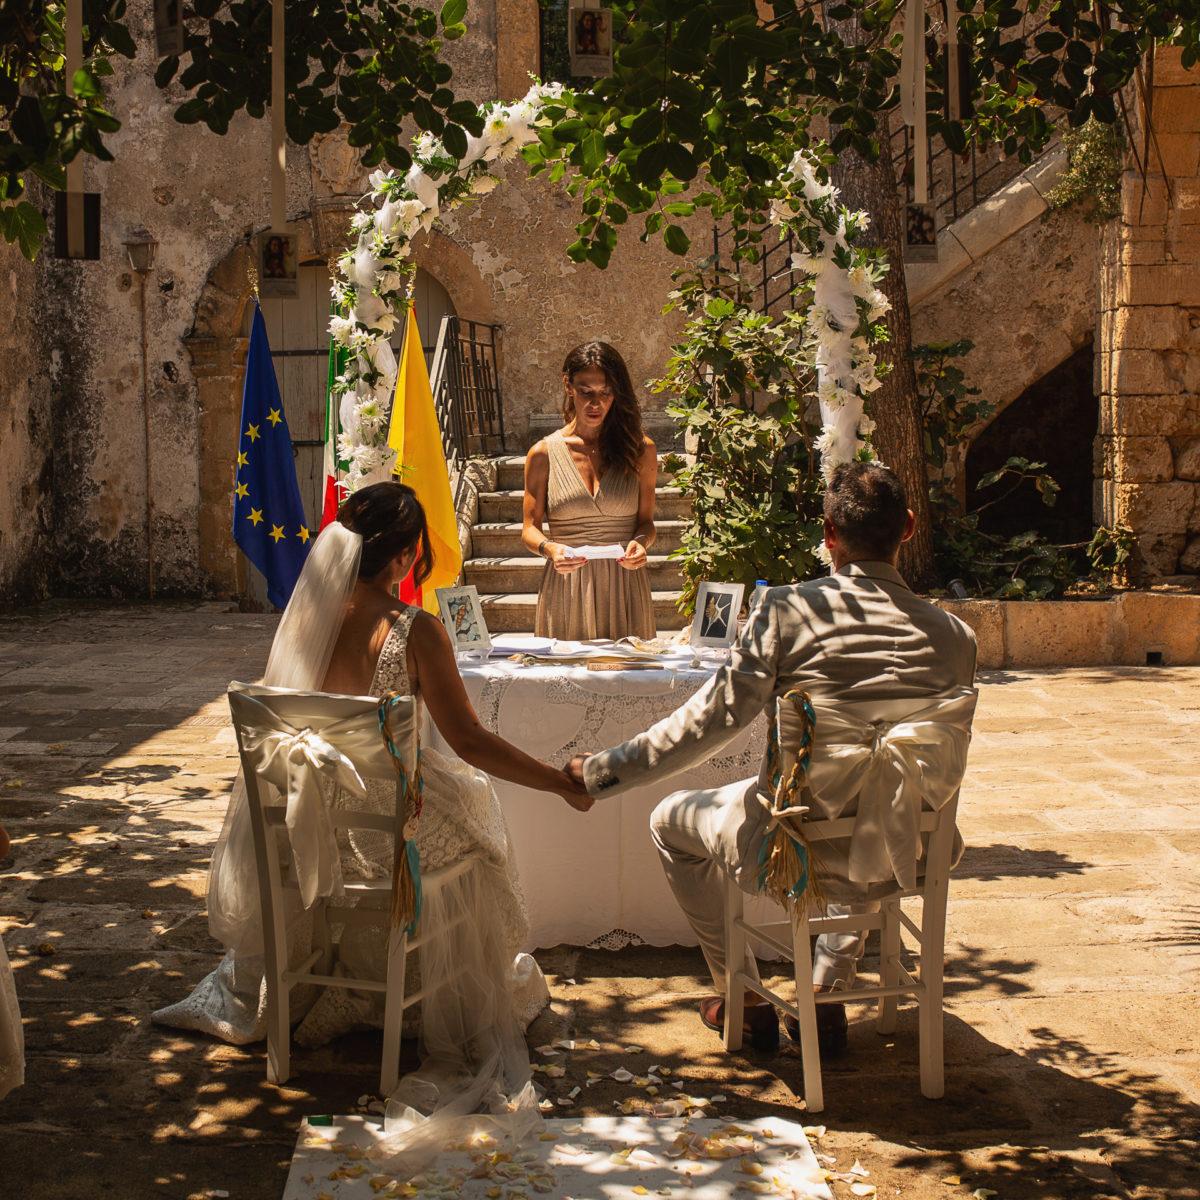 3B6A7303-1200x800 Roberta e Simone, un matrimonio a Marzamemi storiedimatrimonio matrimoni blog  wedding story reportage photography matrimonio fotografo carmineprestipino carminefotografie